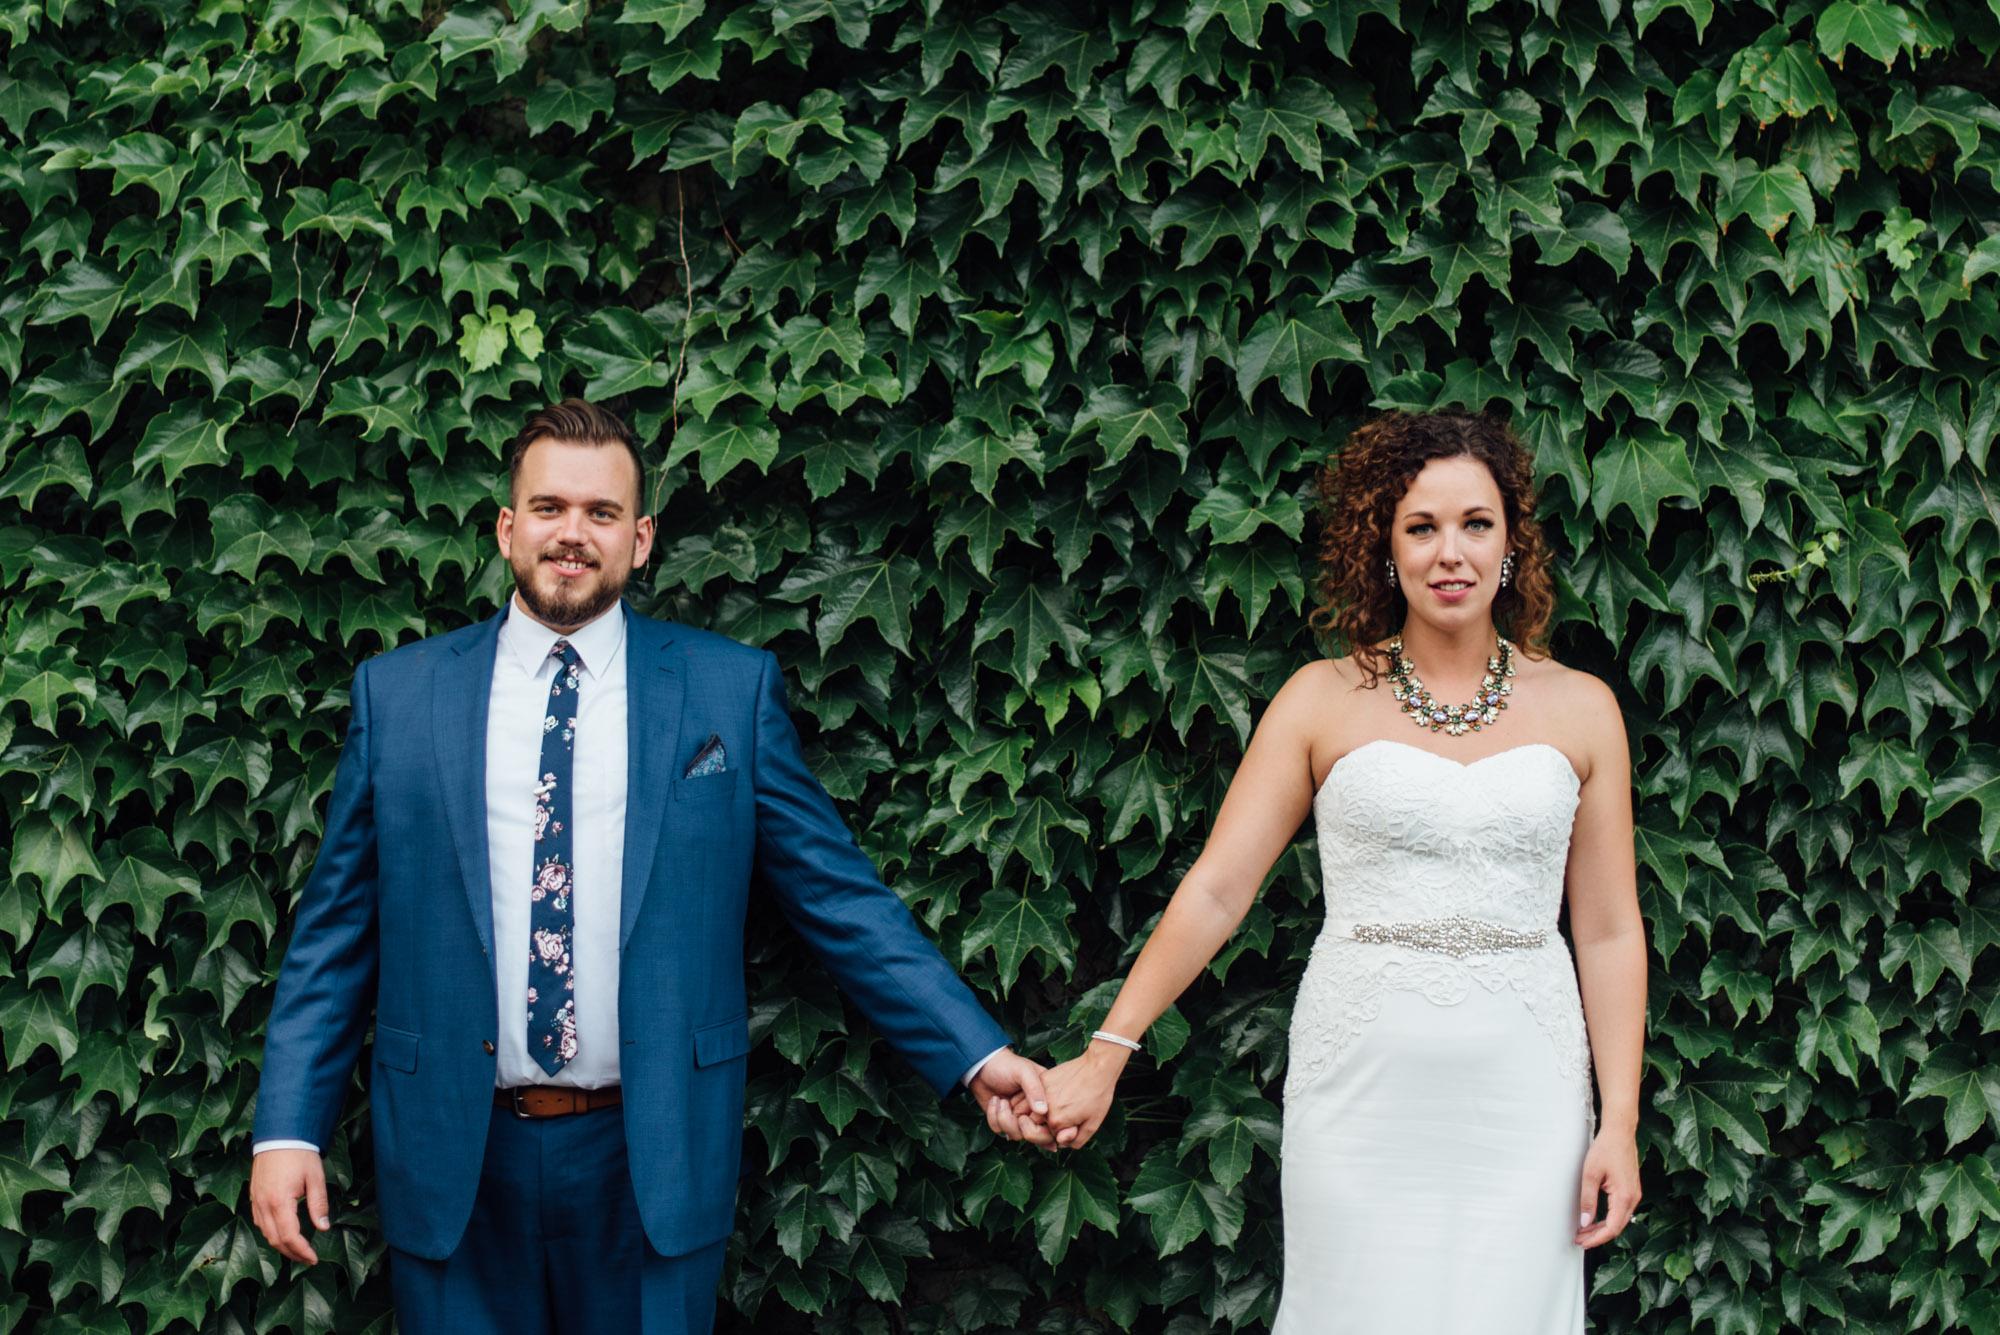 five-event-center-wedding-photographe-20.jpg